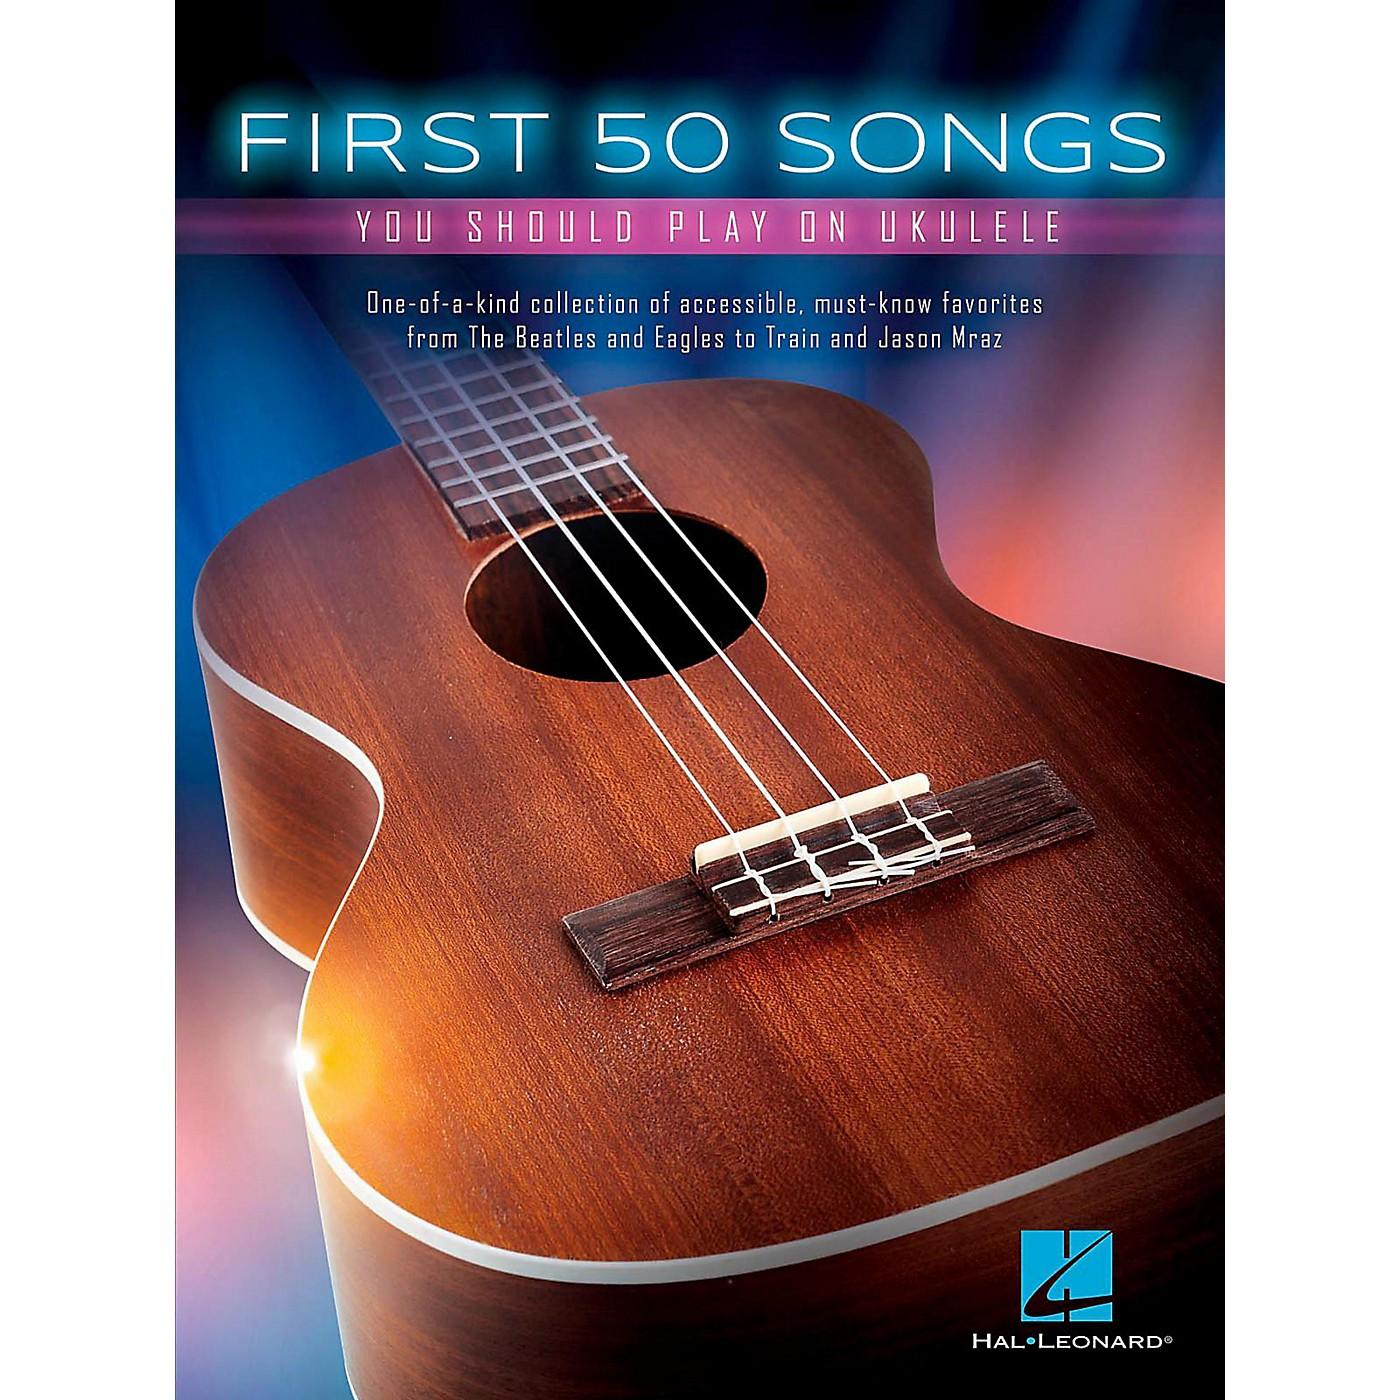 Hal Leonard First 50 Songs You Should Play on Ukulele thumbnail